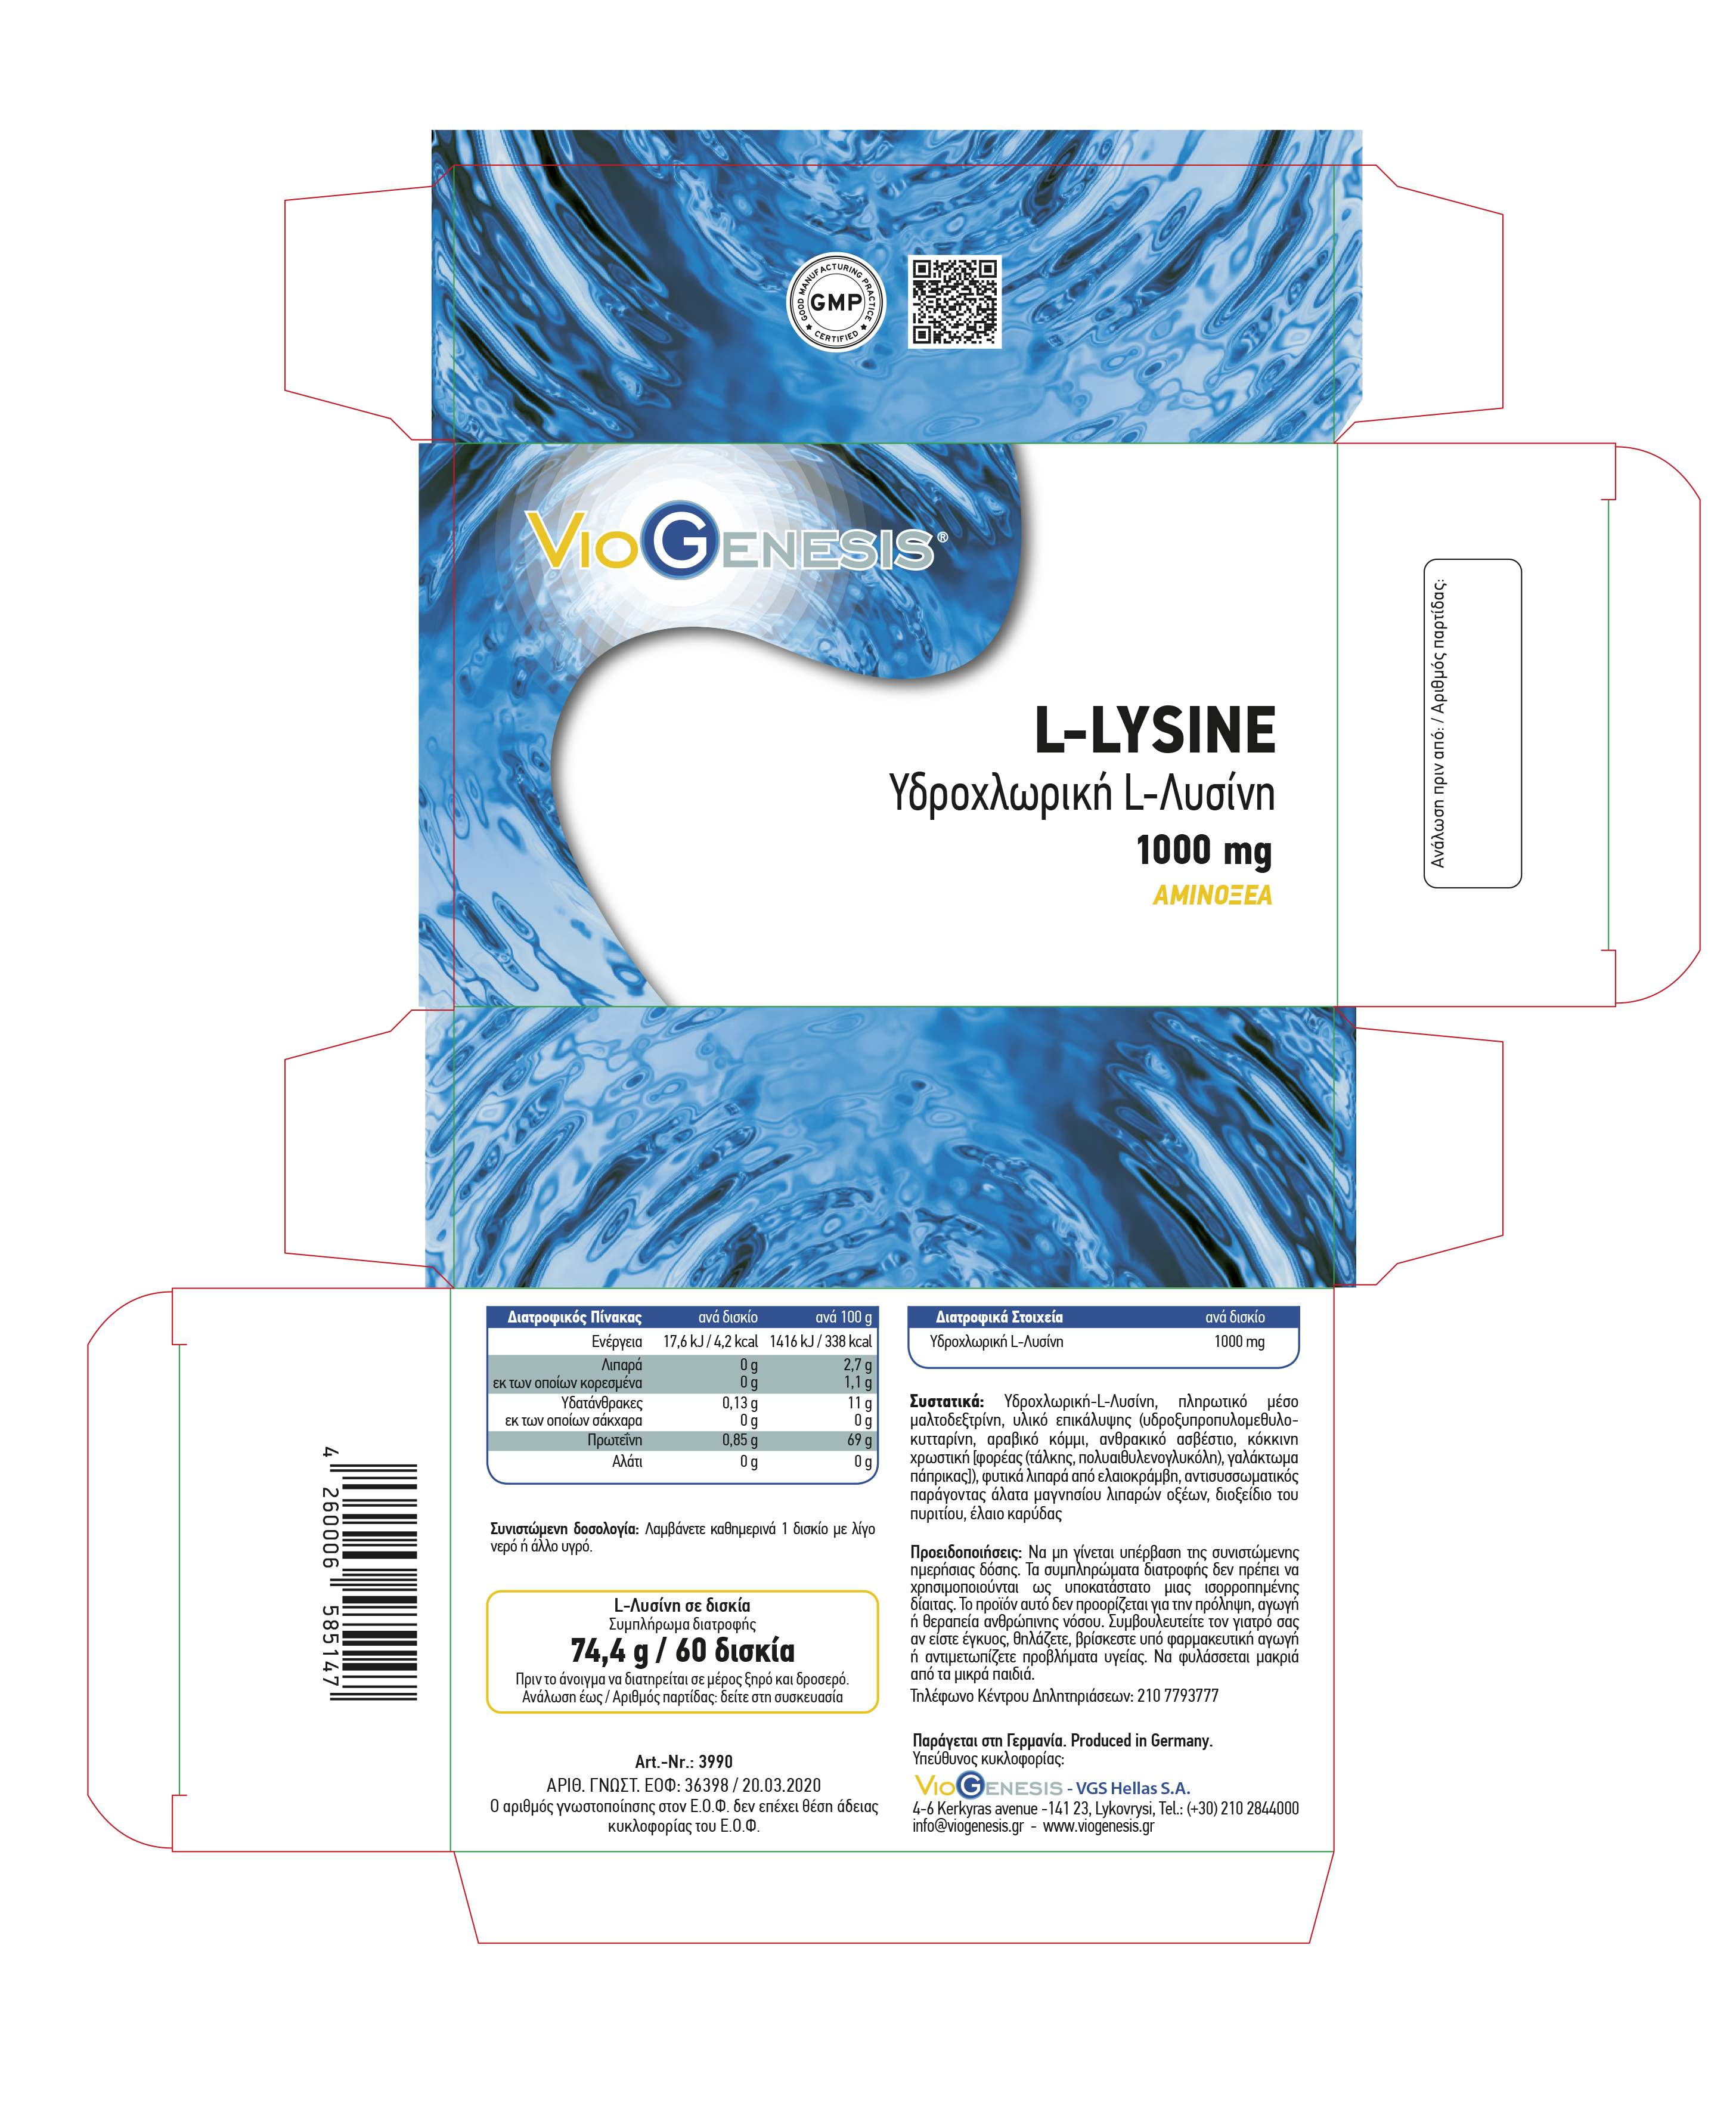 L-LYSINE-1000mg-LABEL